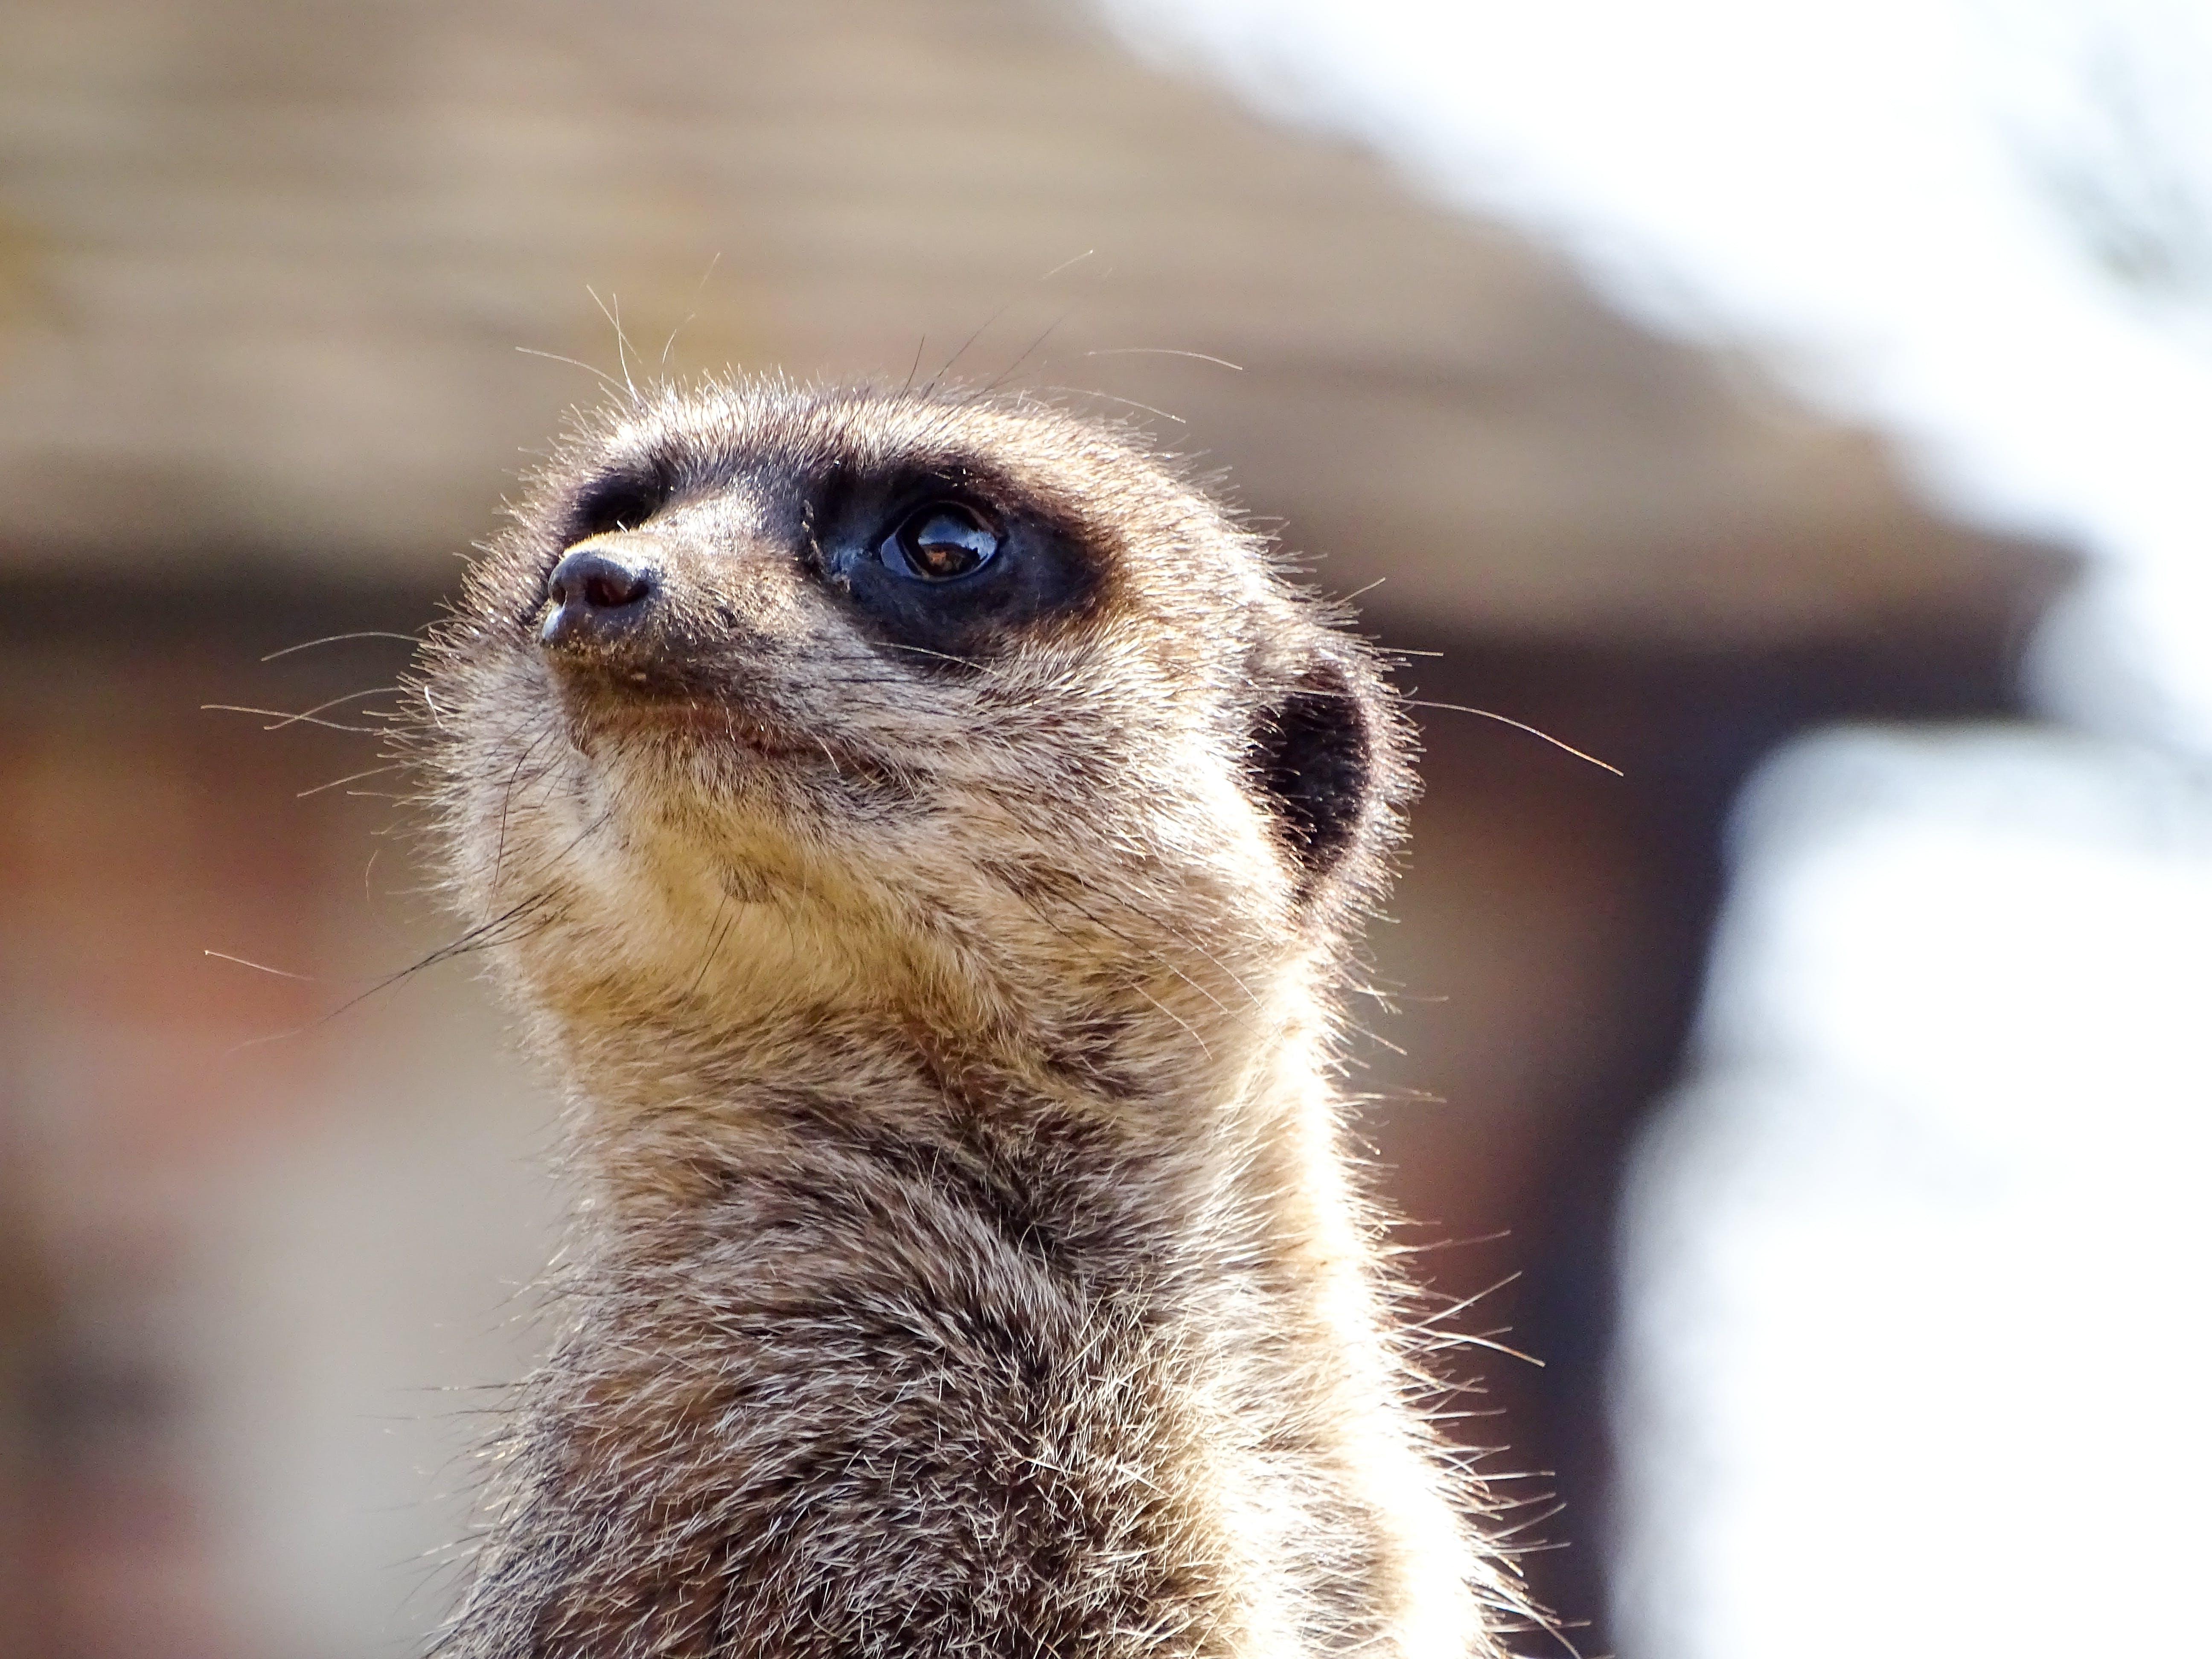 Free stock photo of animal, animals, blurred background, meerkat